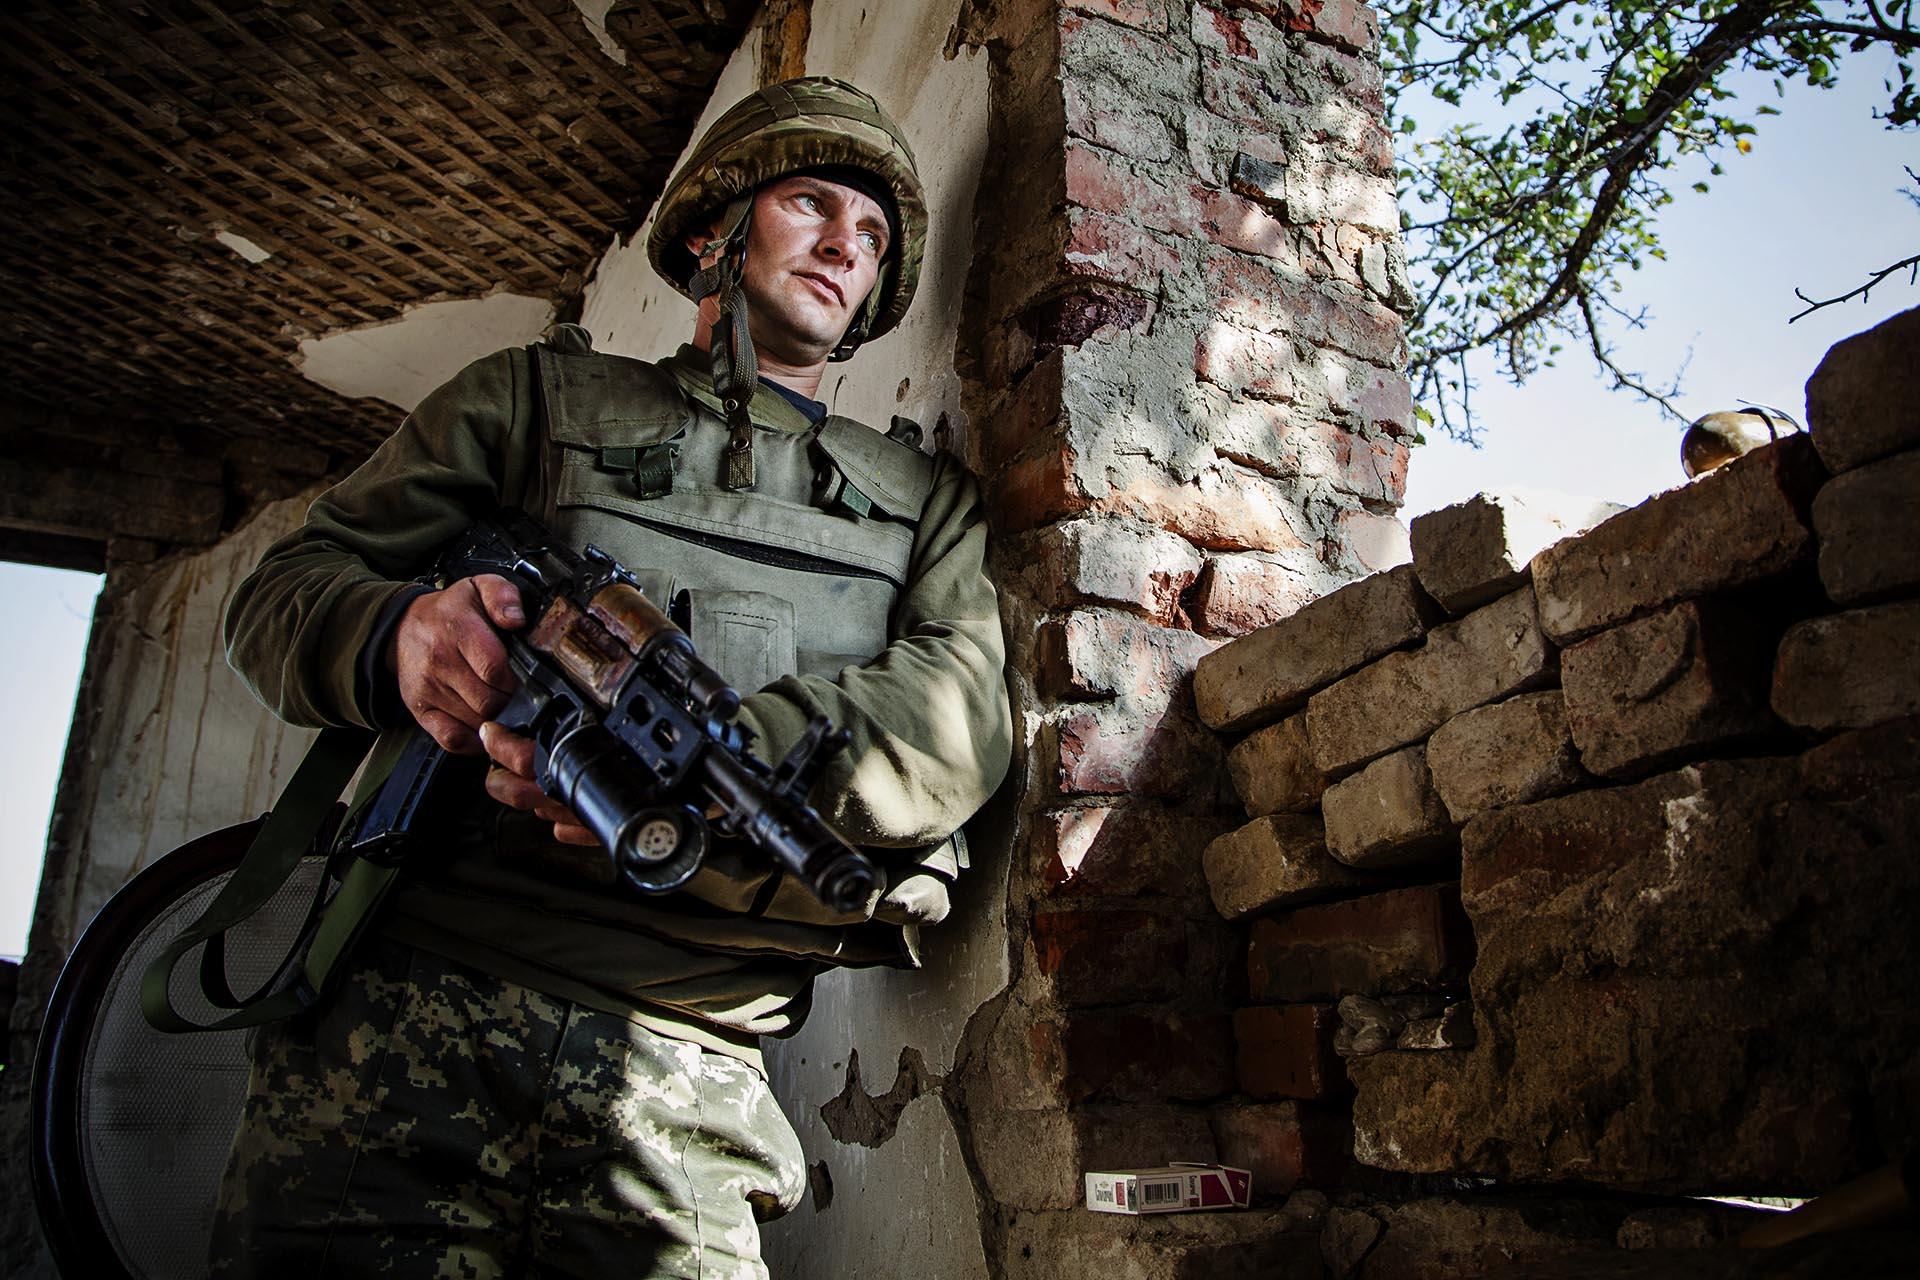 Ucrania, guerra congelada